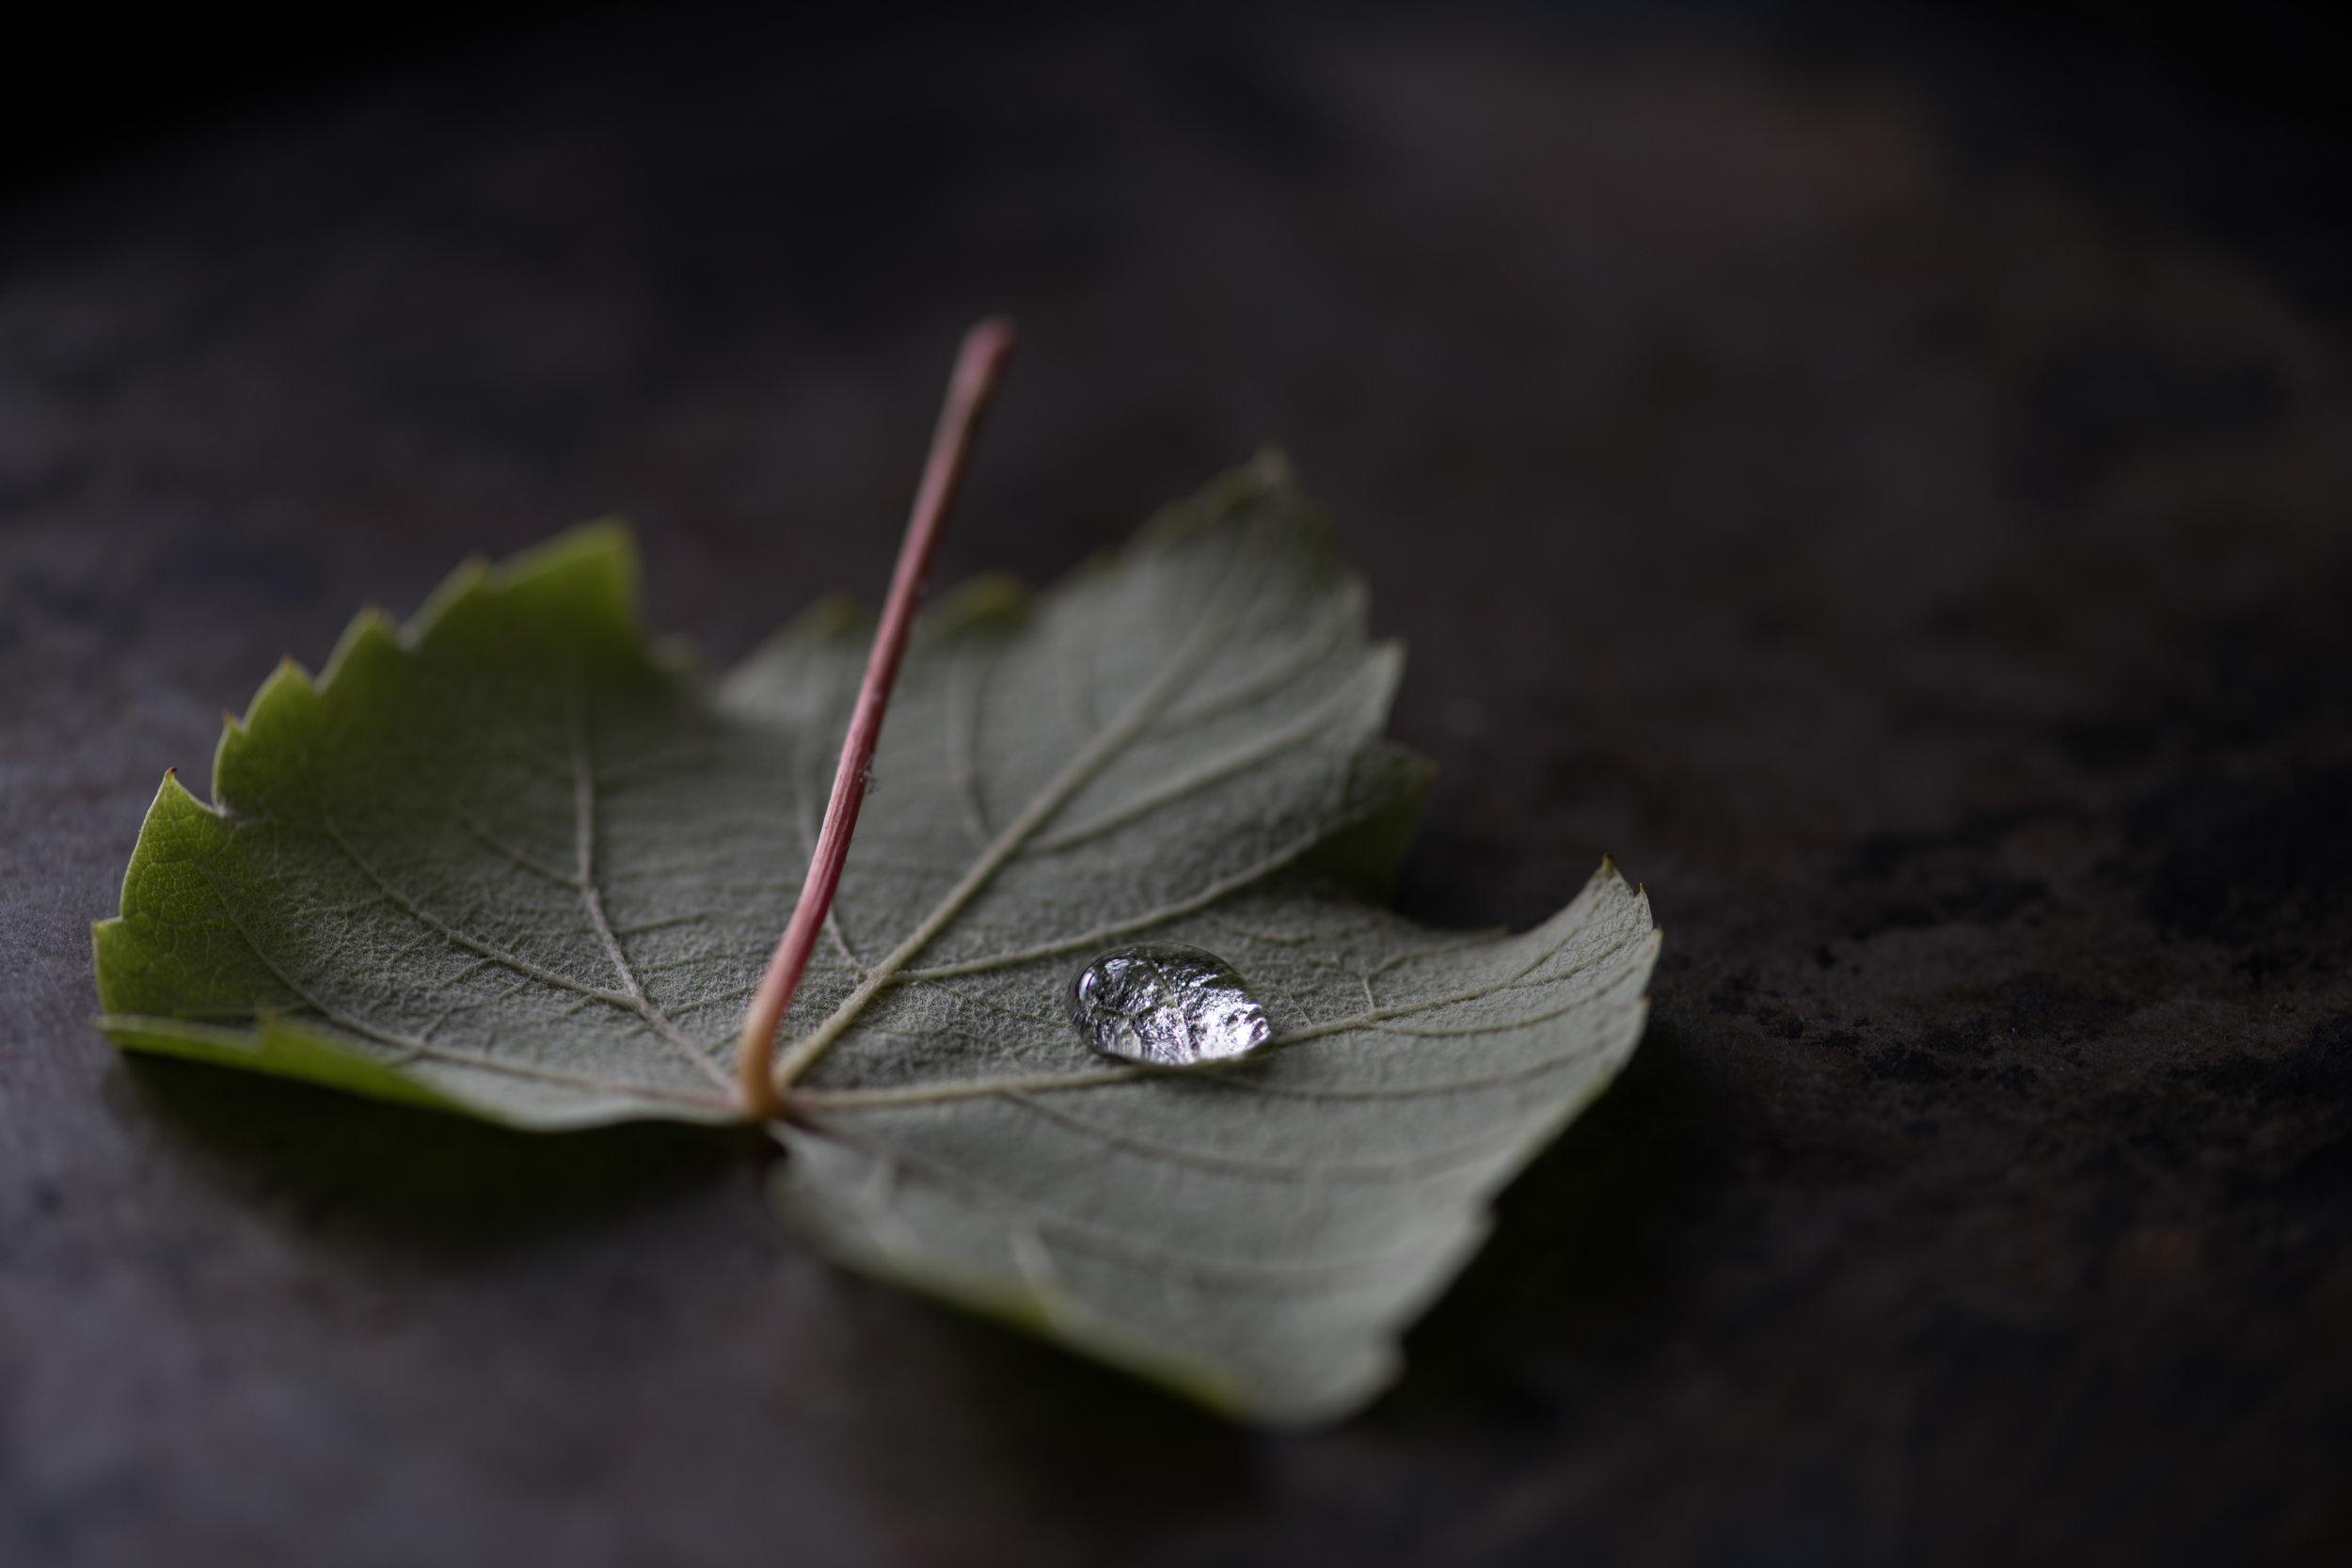 Grape leaf with drop